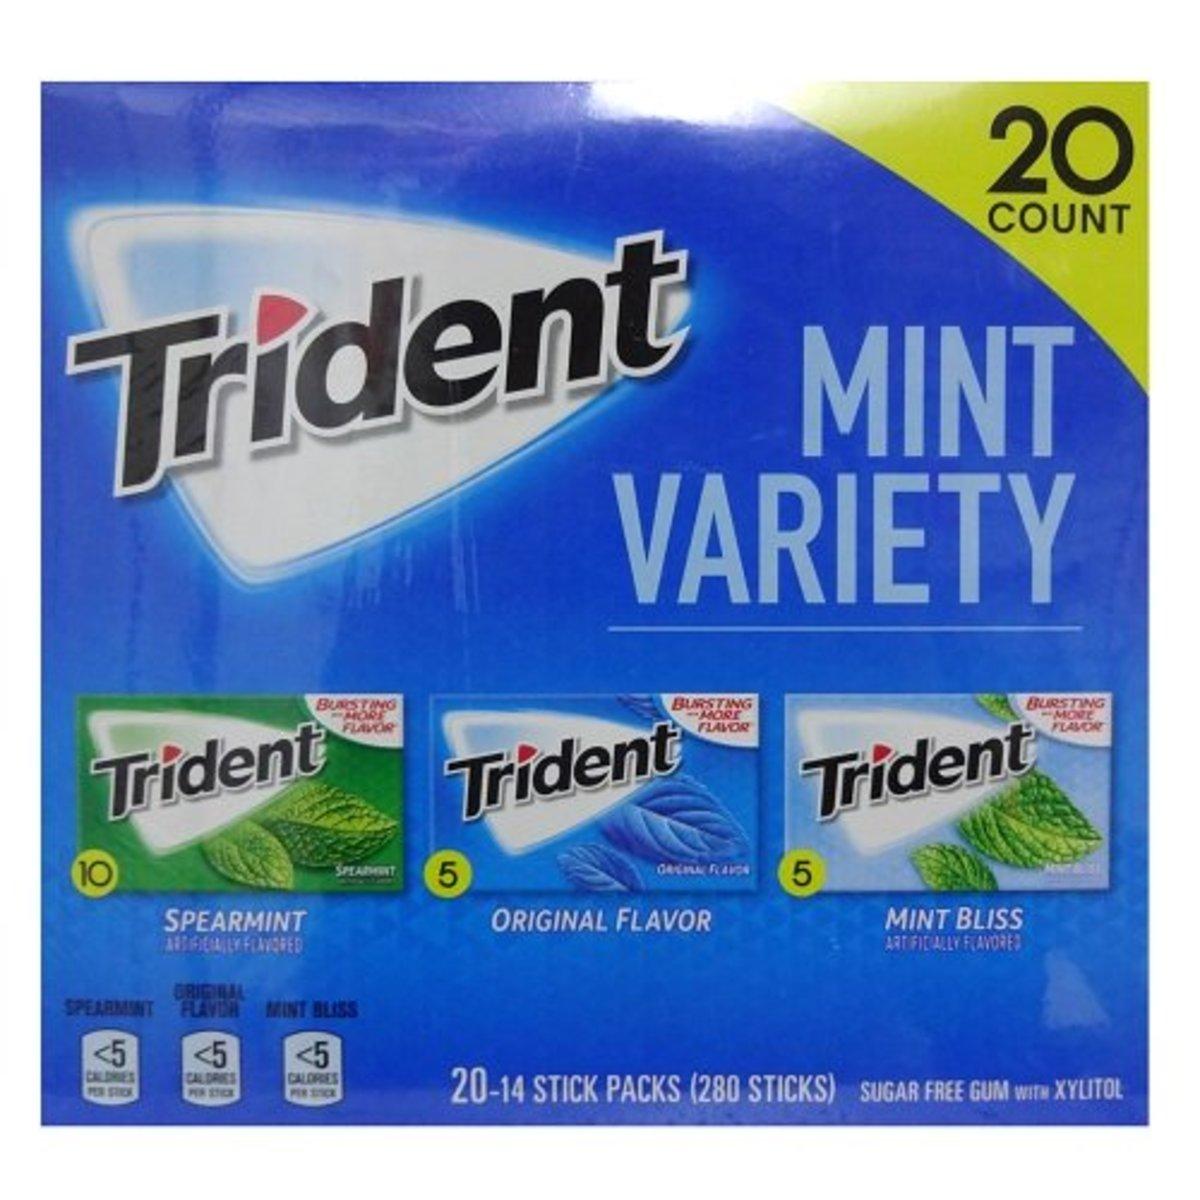 Different Trident mint flavors